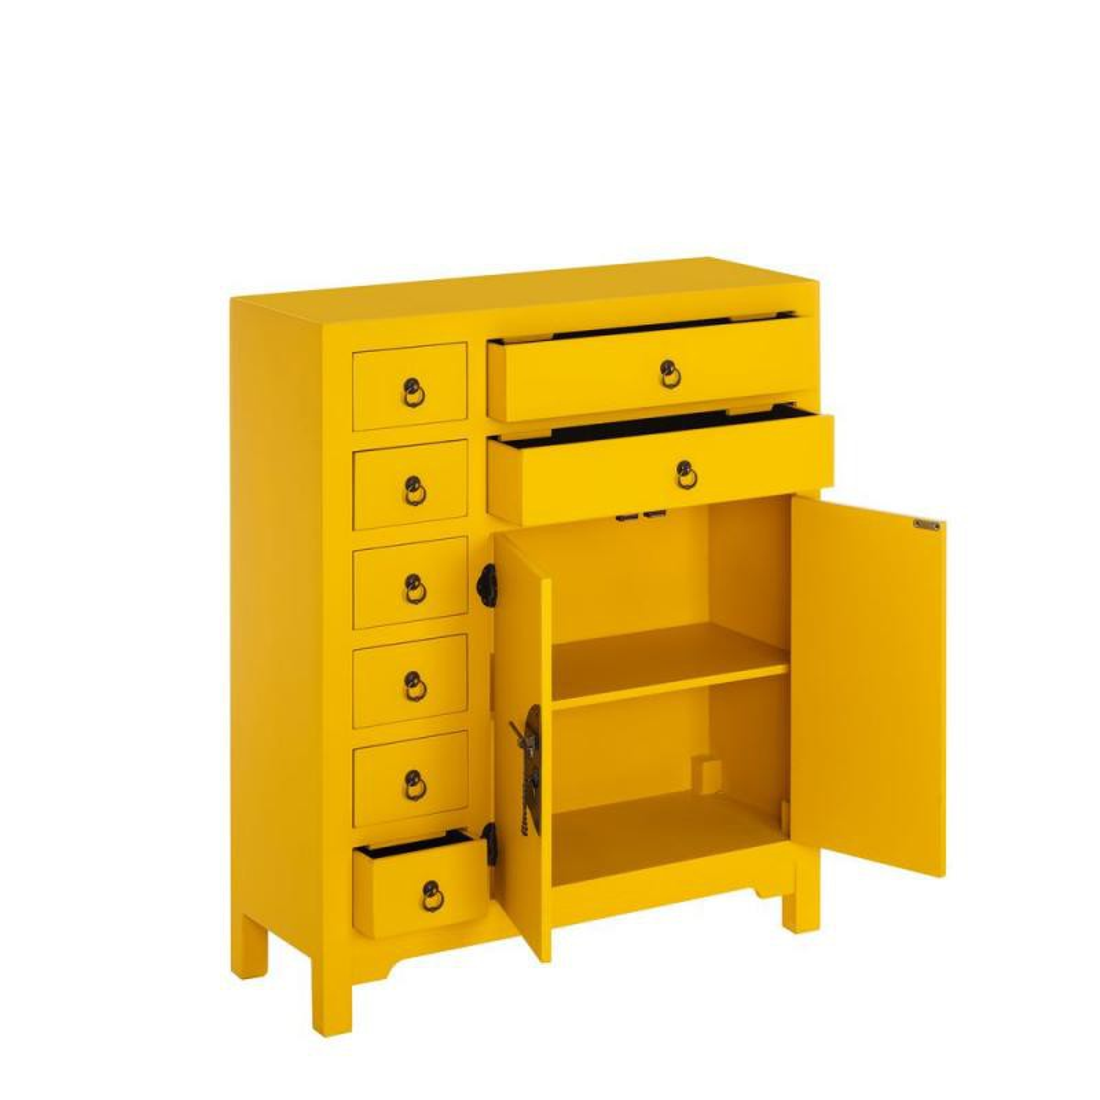 meuble d 39 entr e jaune meuble chinois pekin univers petits meubles. Black Bedroom Furniture Sets. Home Design Ideas